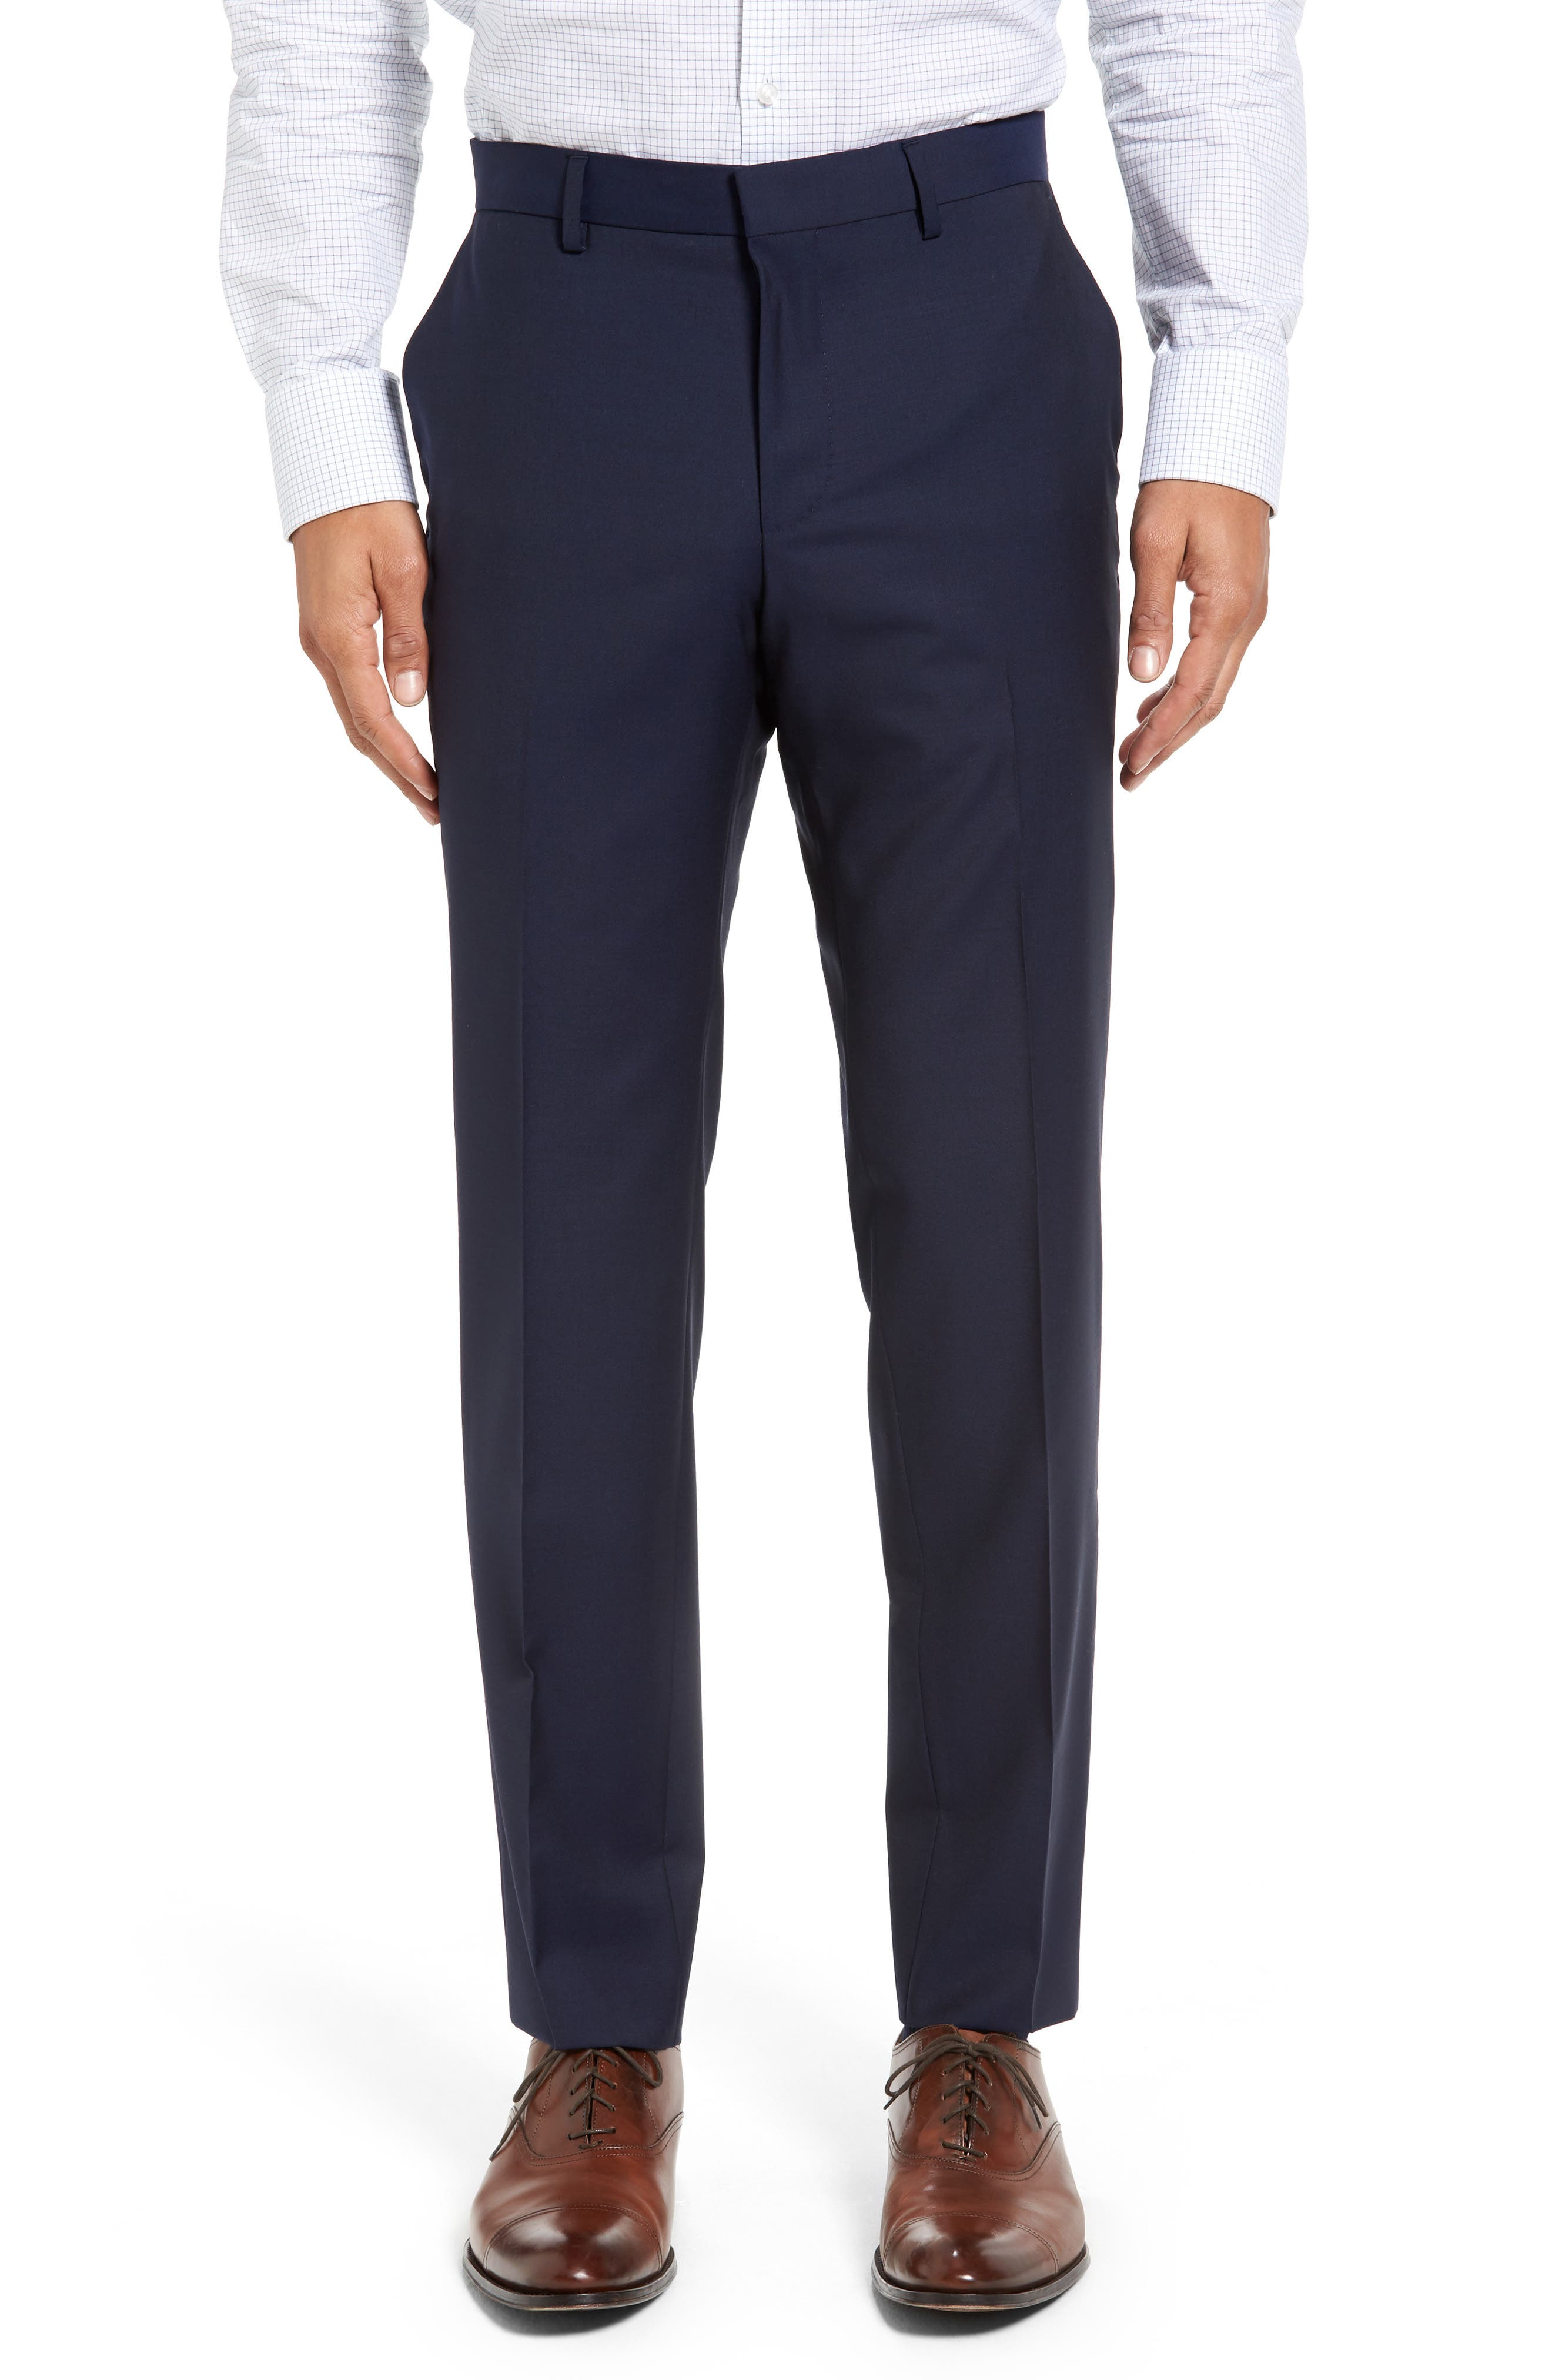 BOSS, Huge/Genius Trim Fit Navy Wool Suit, Alternate thumbnail 6, color, 410